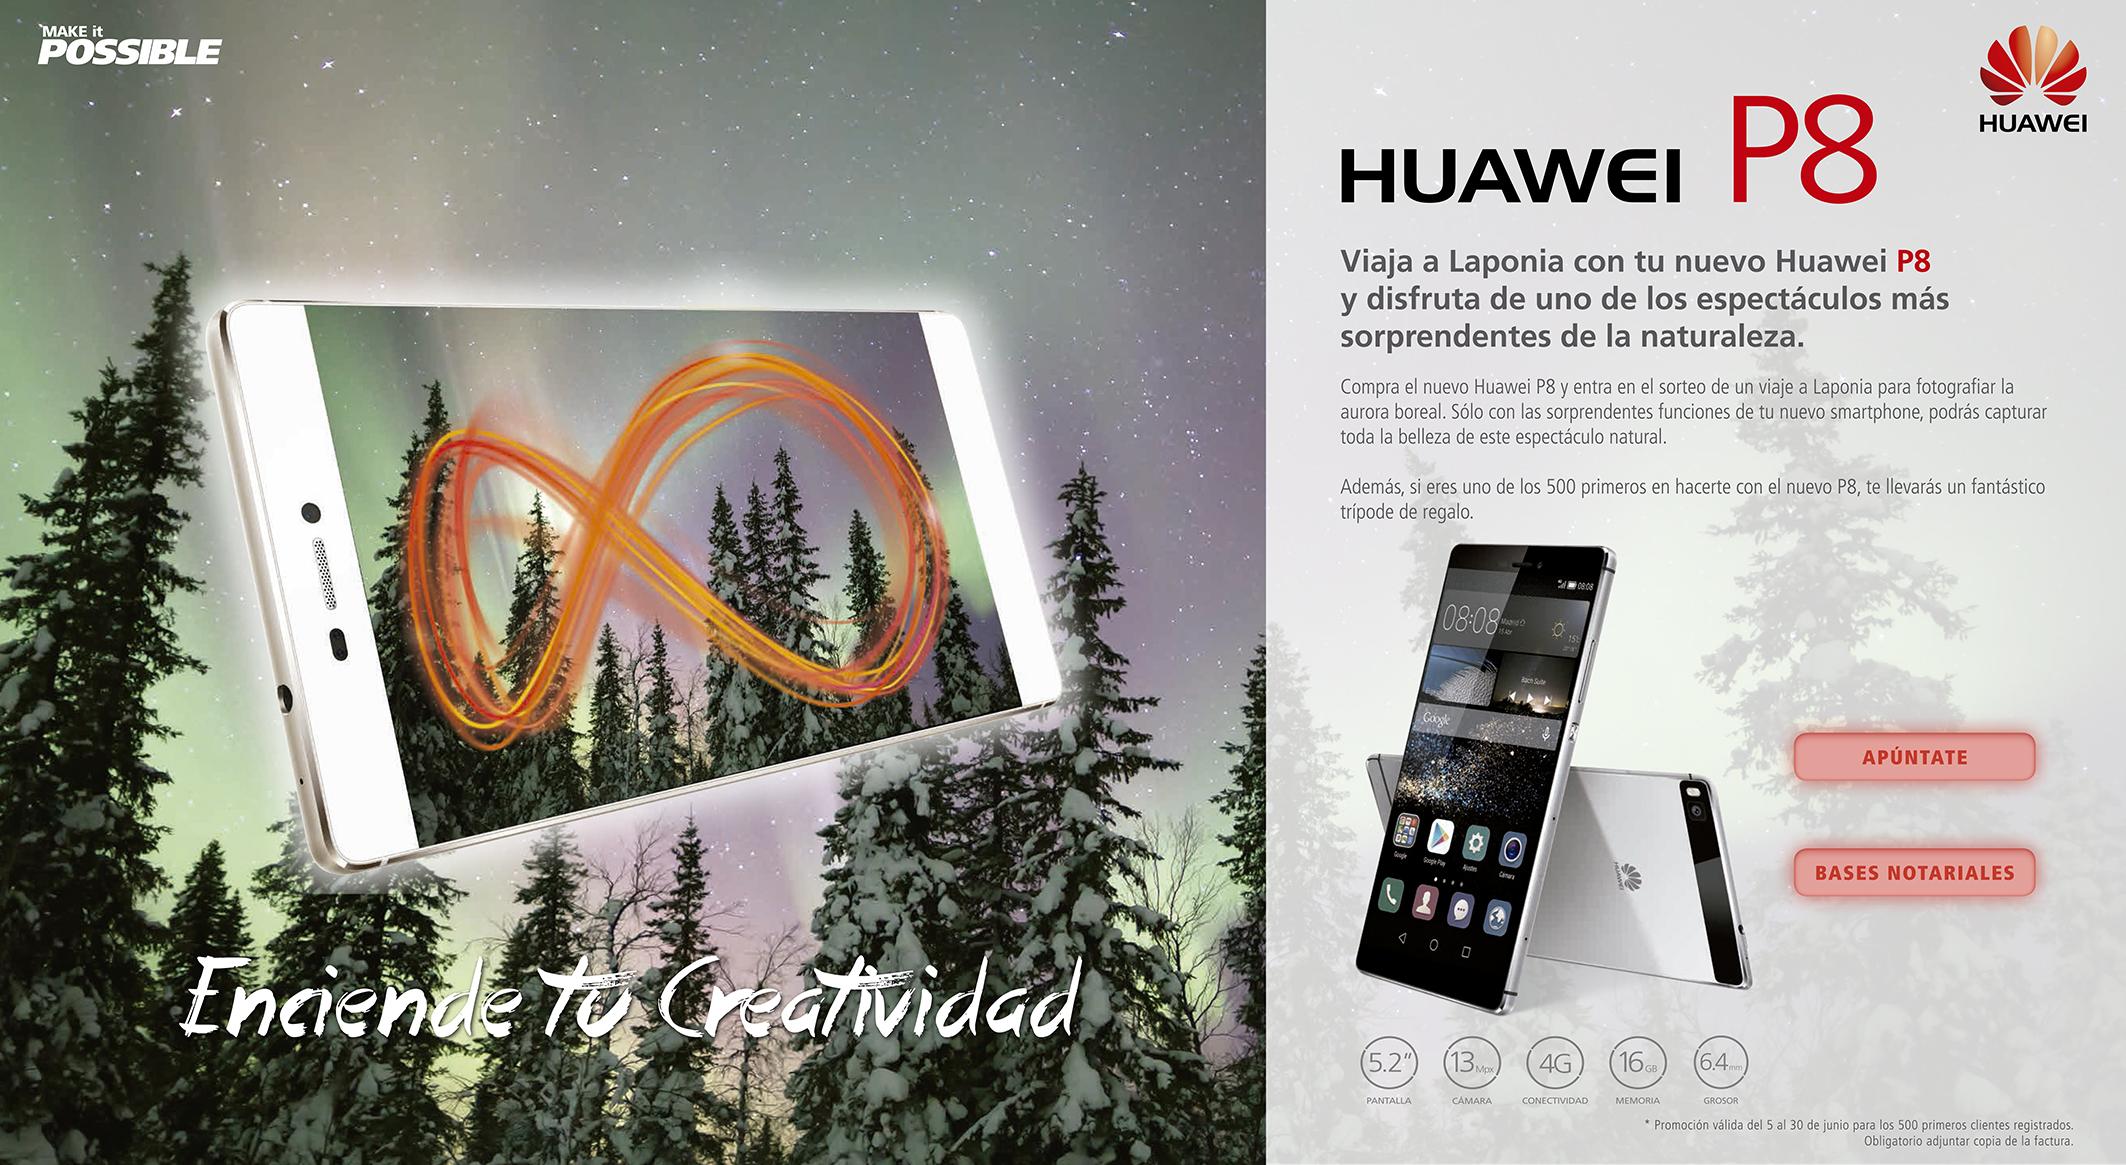 Huawei P8 Viaje a Laponia